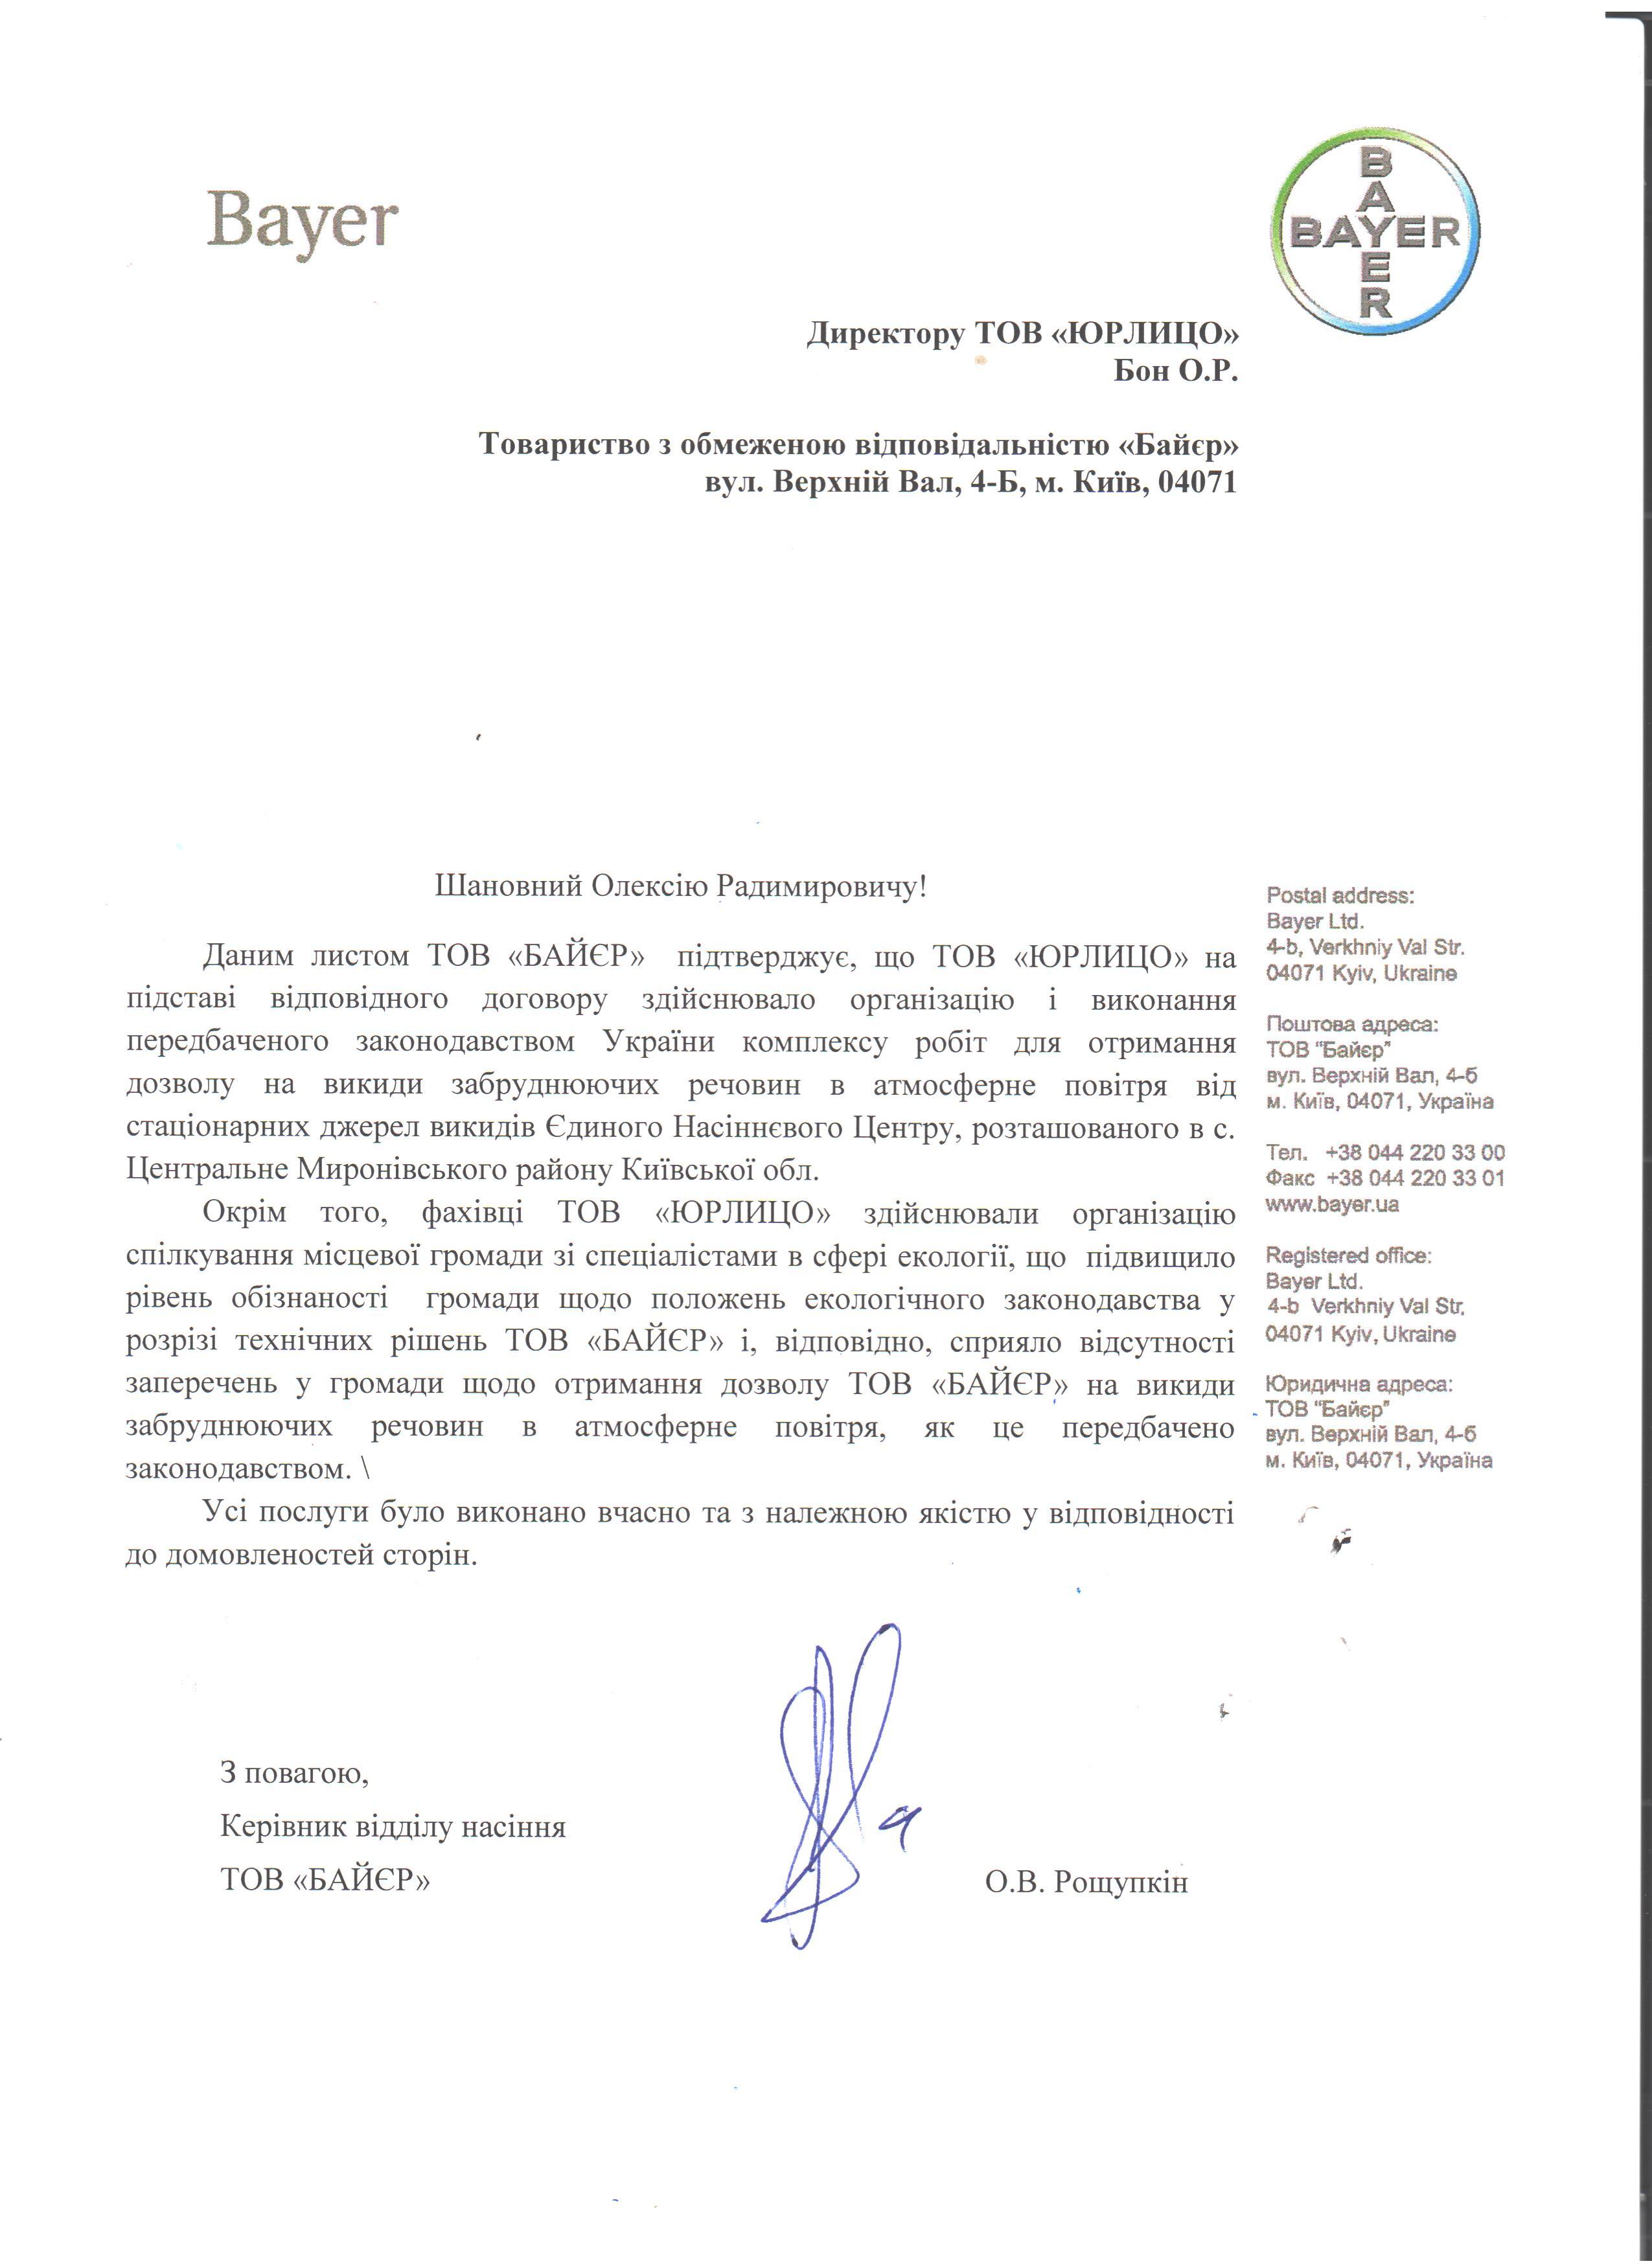 Письо благодарности коллективу компании ЮрЛицо от компании БАЙЕР